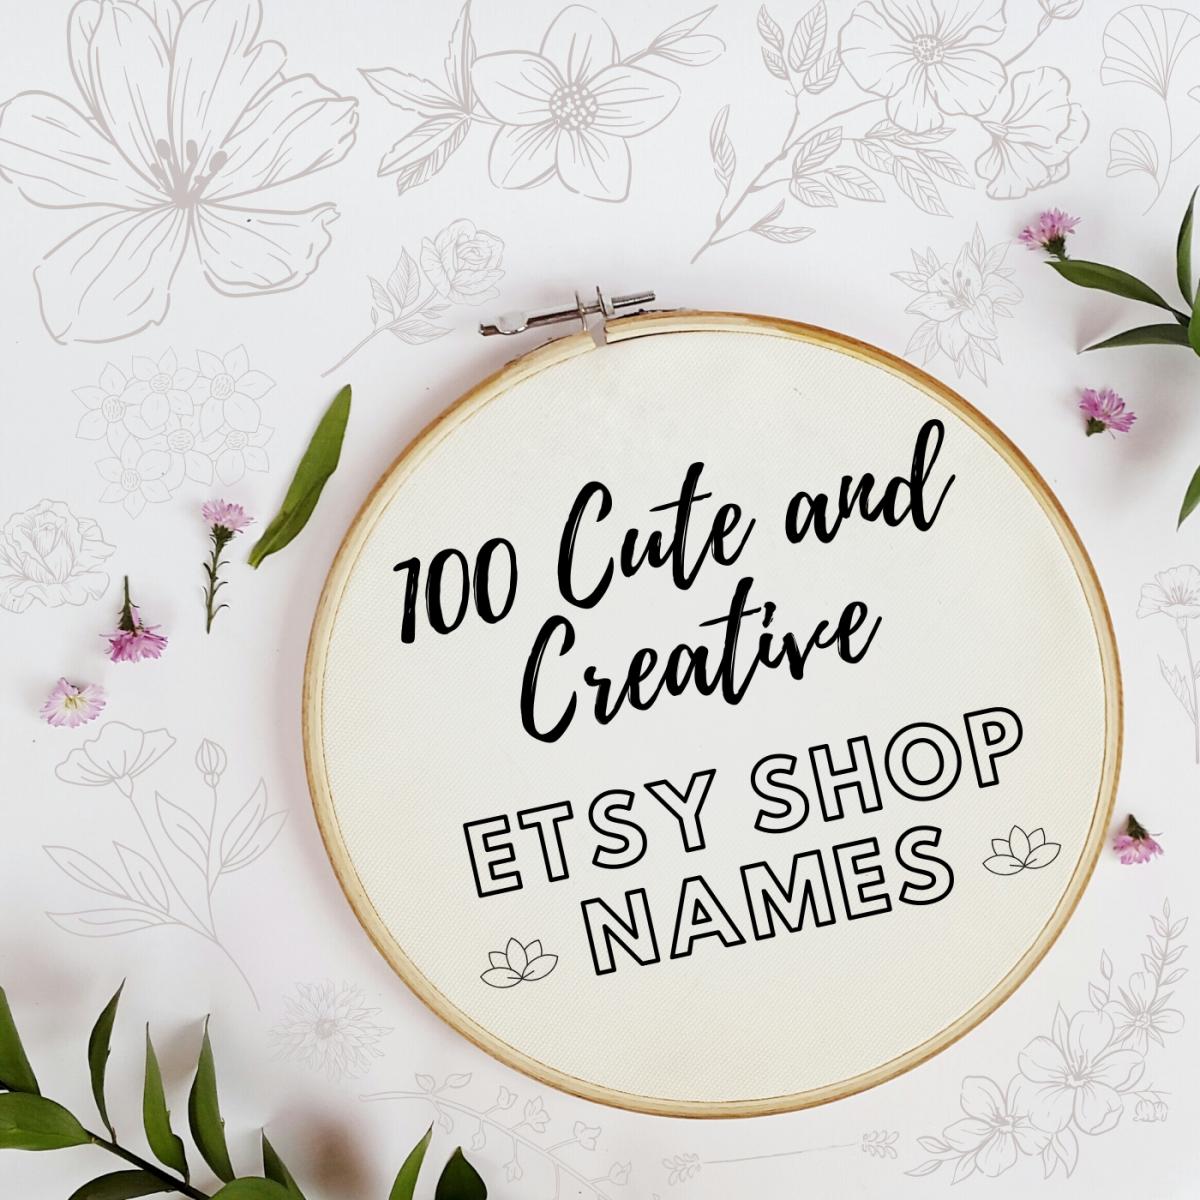 100 Crafty Etsy Shop Name Ideas